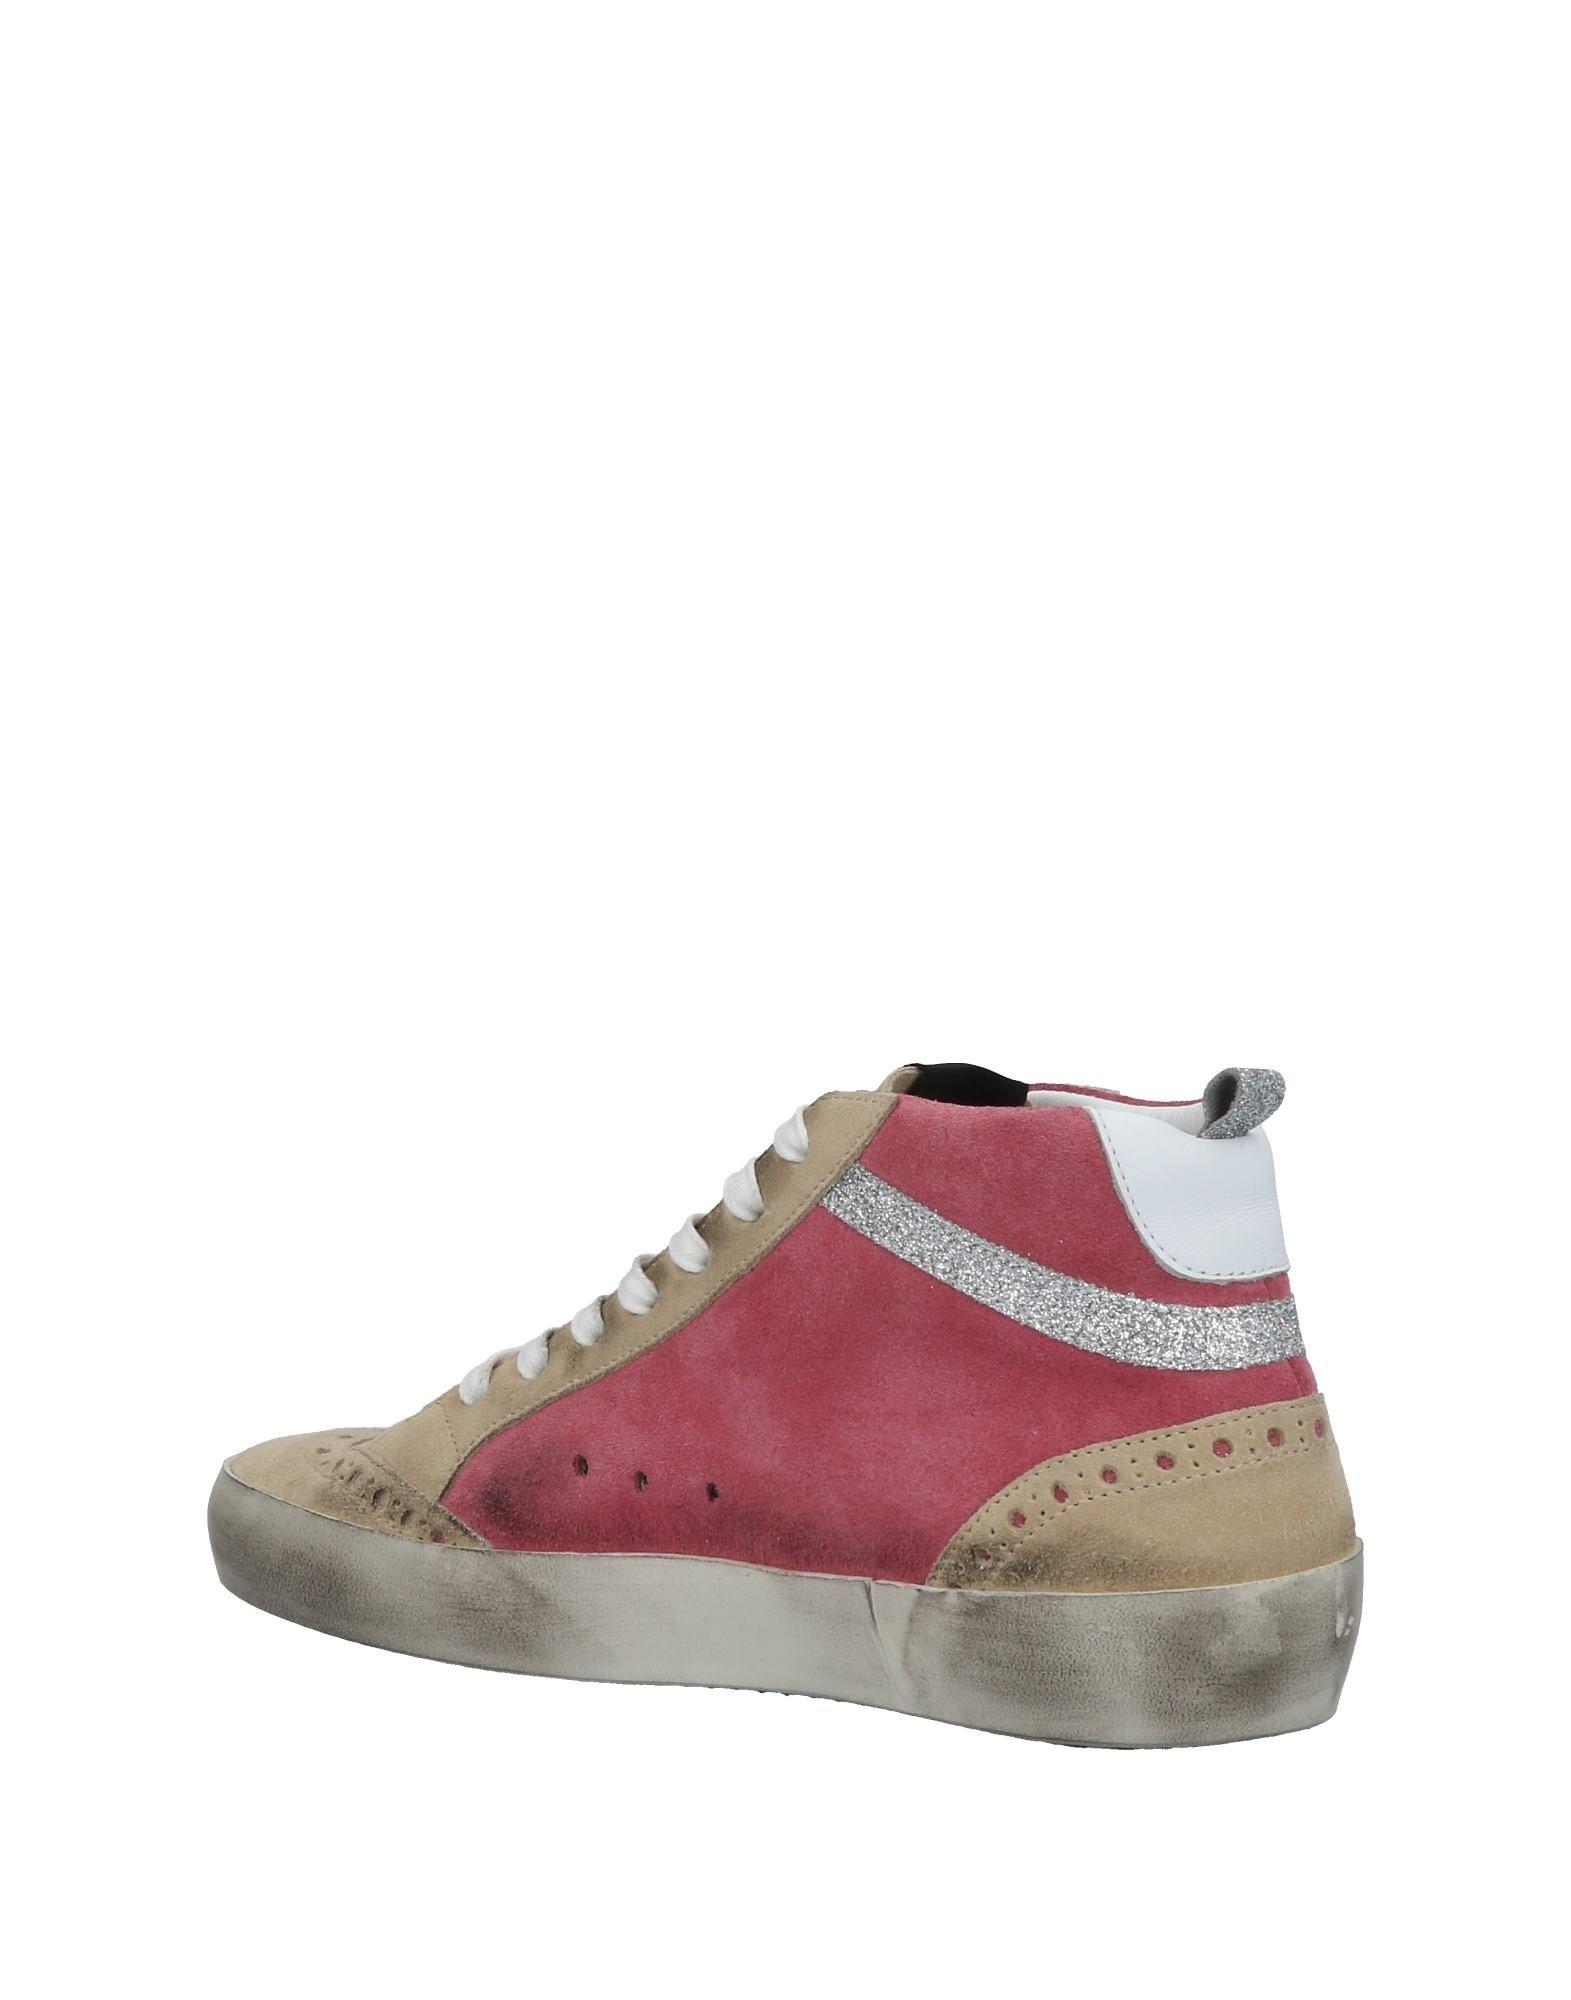 Quattrobarradodici Sneakers Damen  11434319HA Gute Qualität beliebte Schuhe